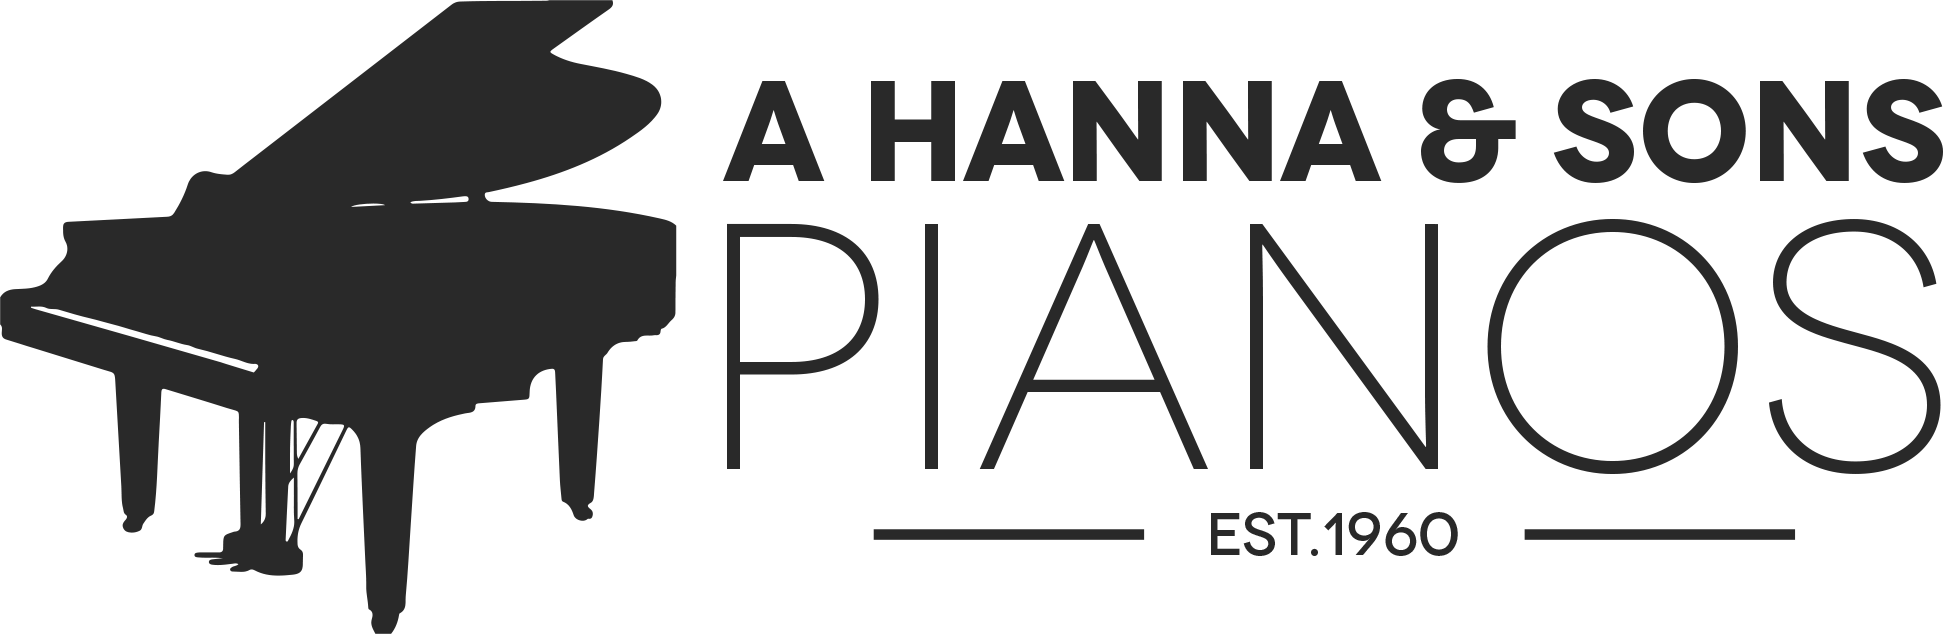 A. Hanna & Sons Pianos